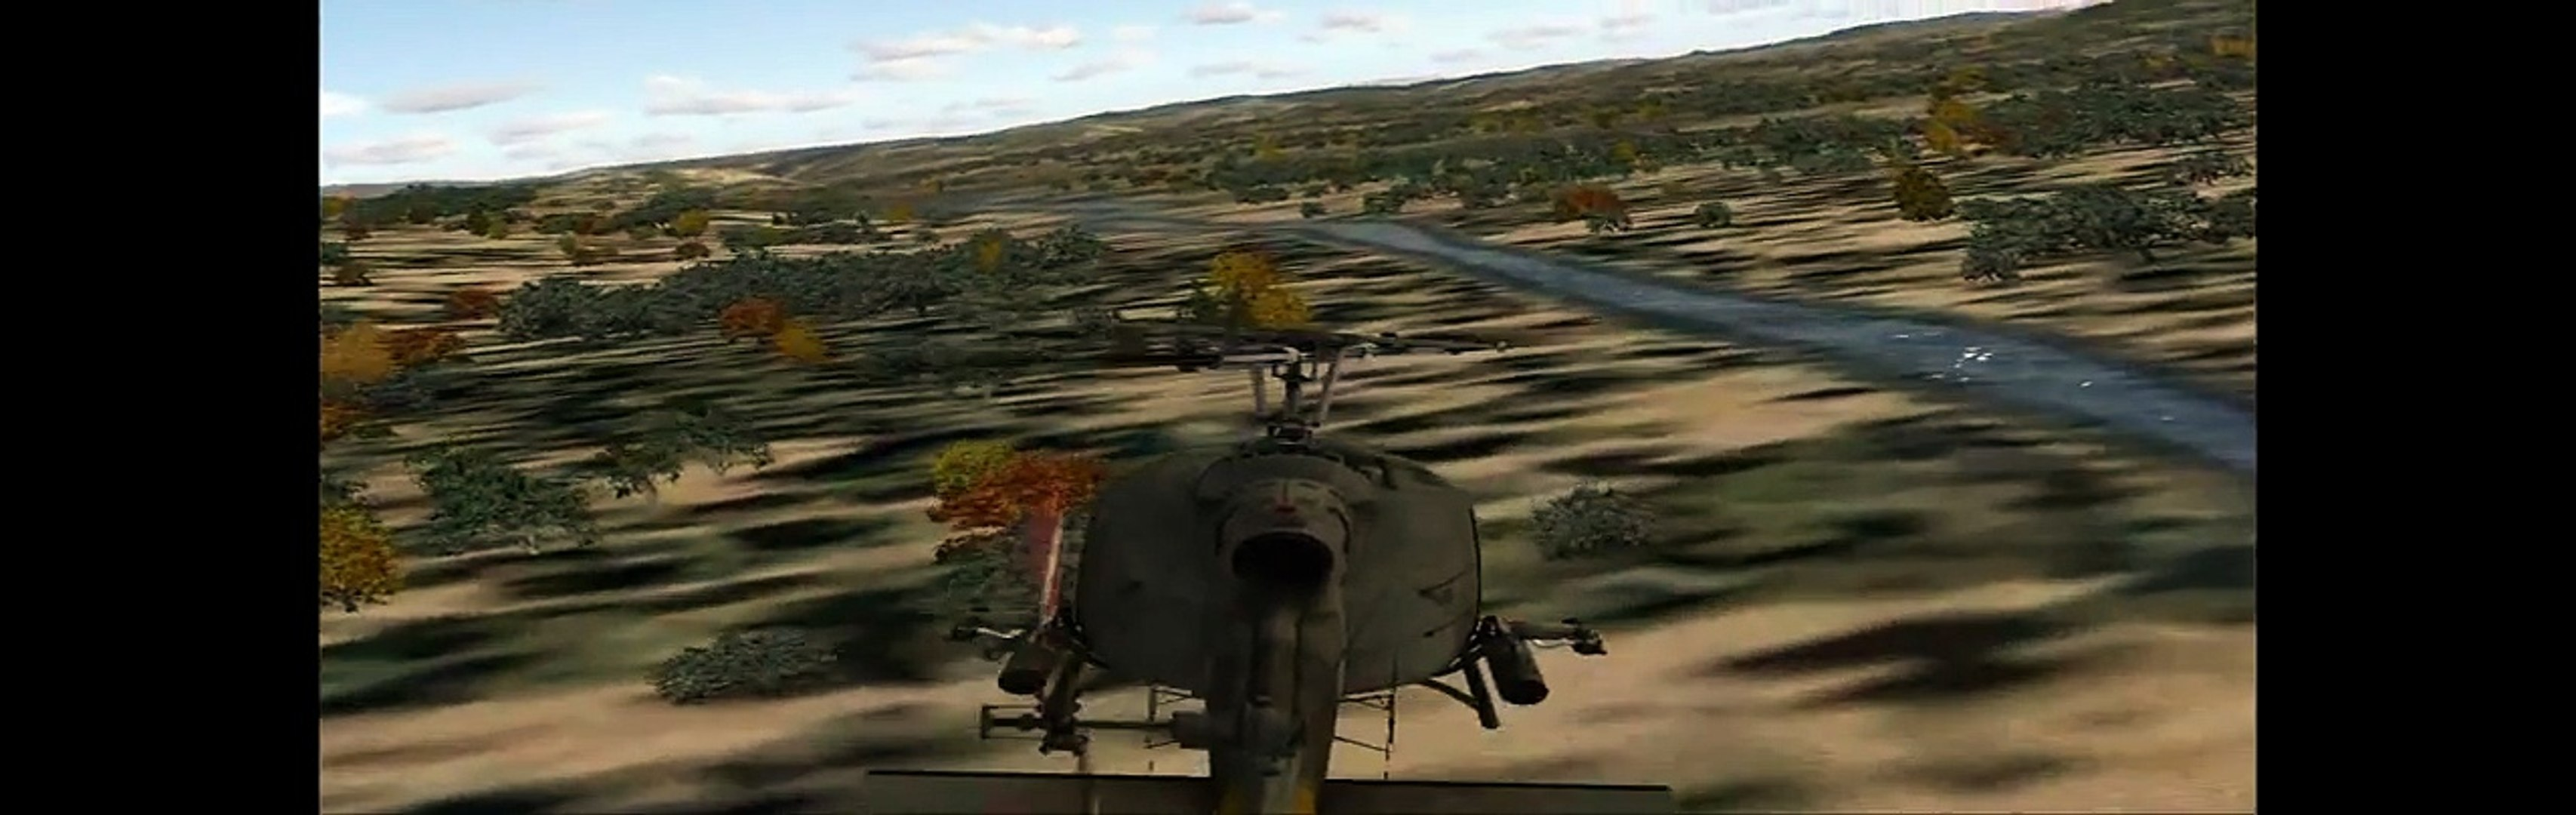 Nemeth Designs Bell UH-1 Huey for FSX